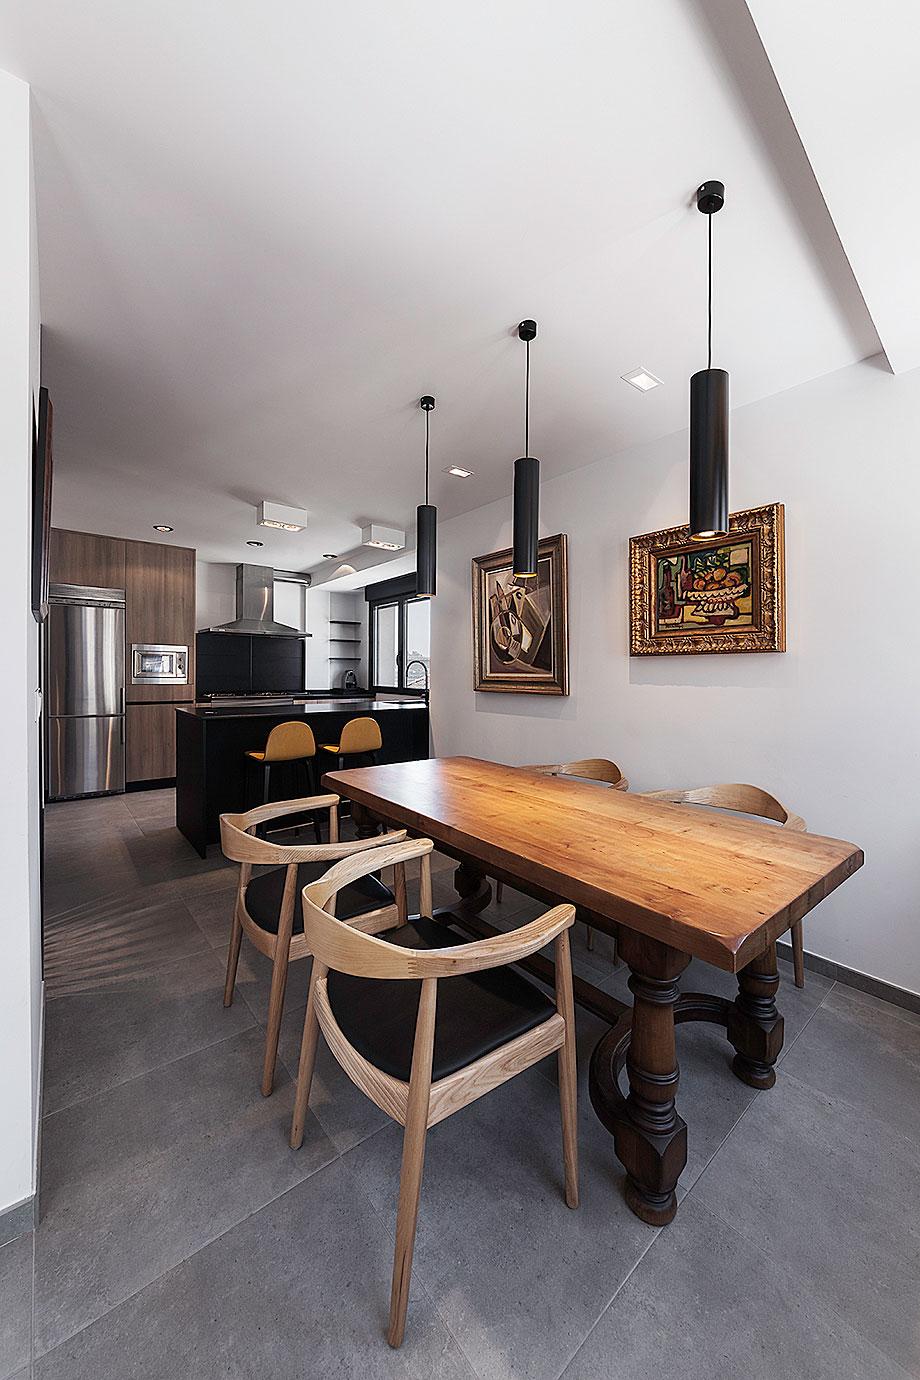 vivienda-nan-arquitectos-6